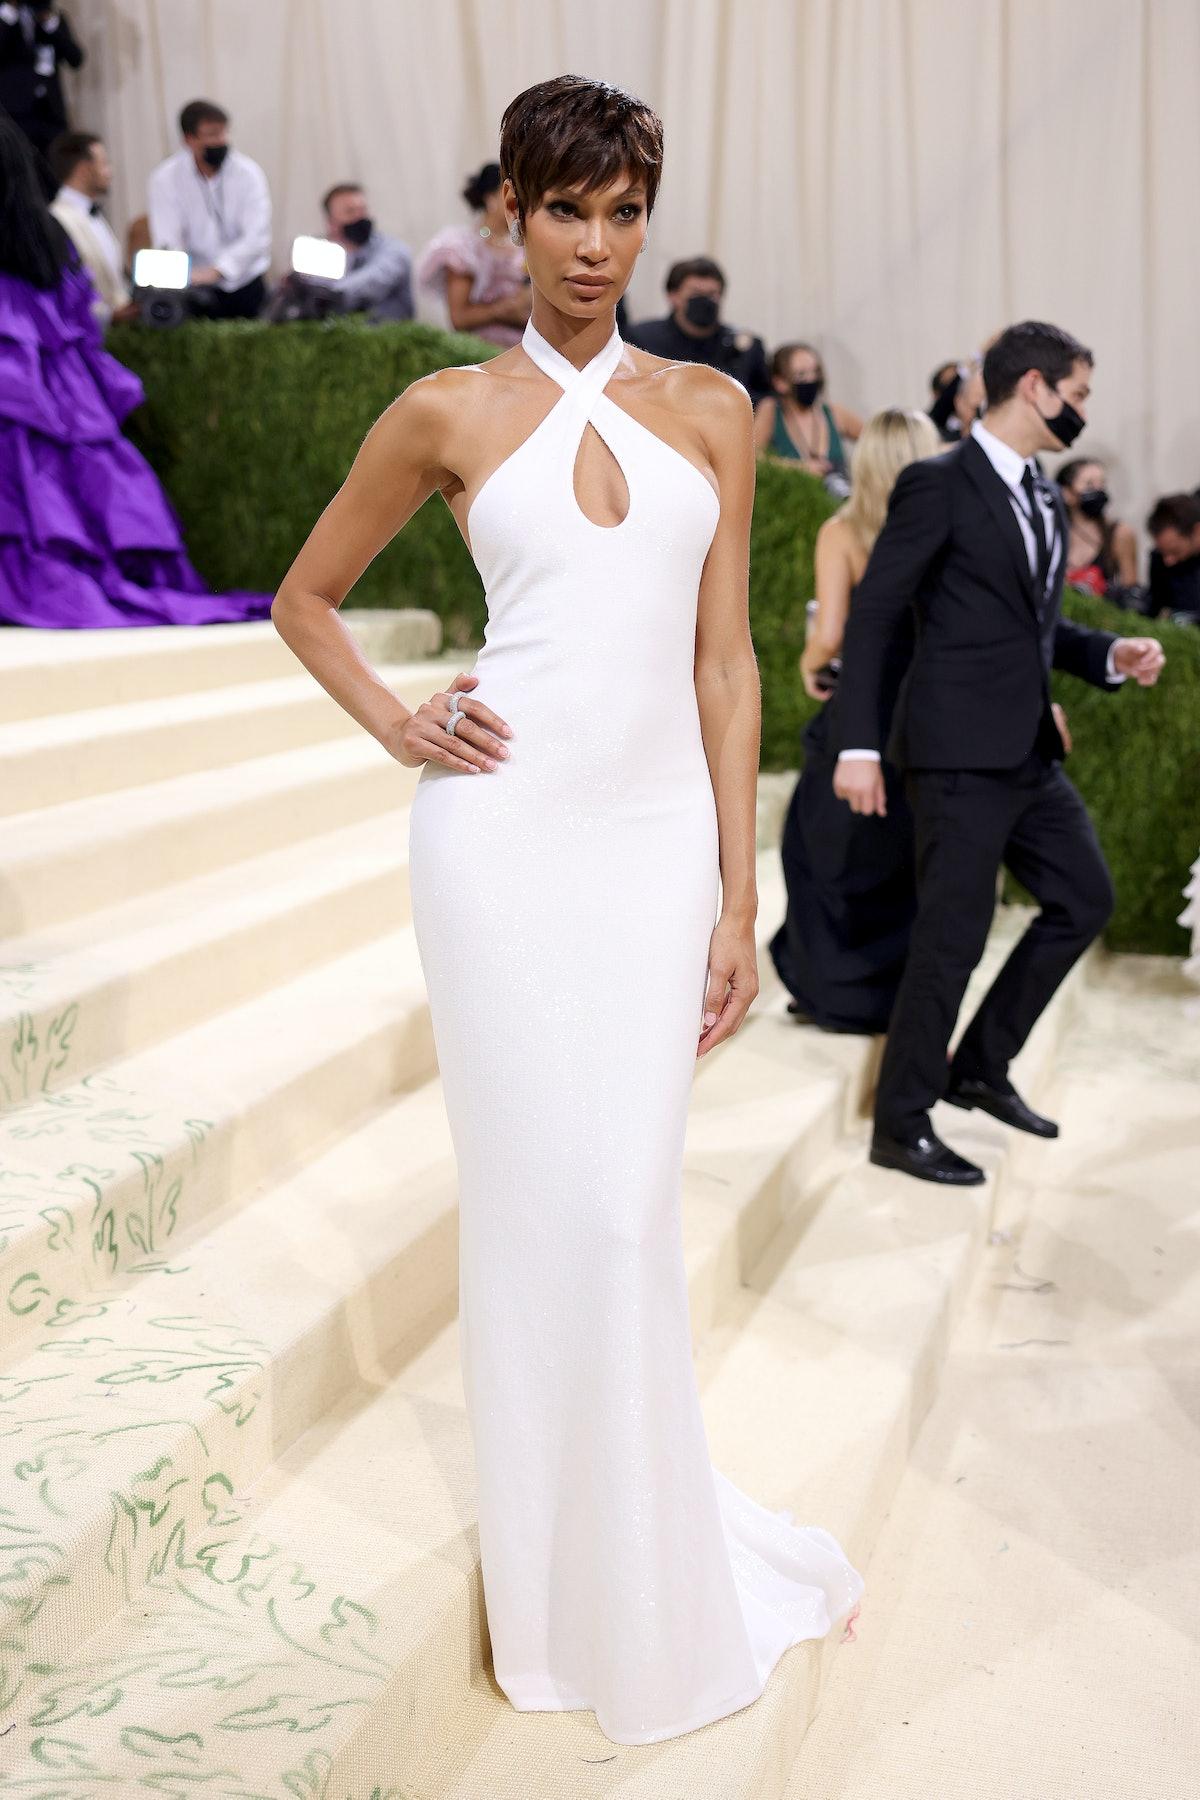 NEW YORK, NEW YORK - SEPTEMBER 13: Model Joan Smalls attends The 2021 Met Gala Celebrating In Americ...